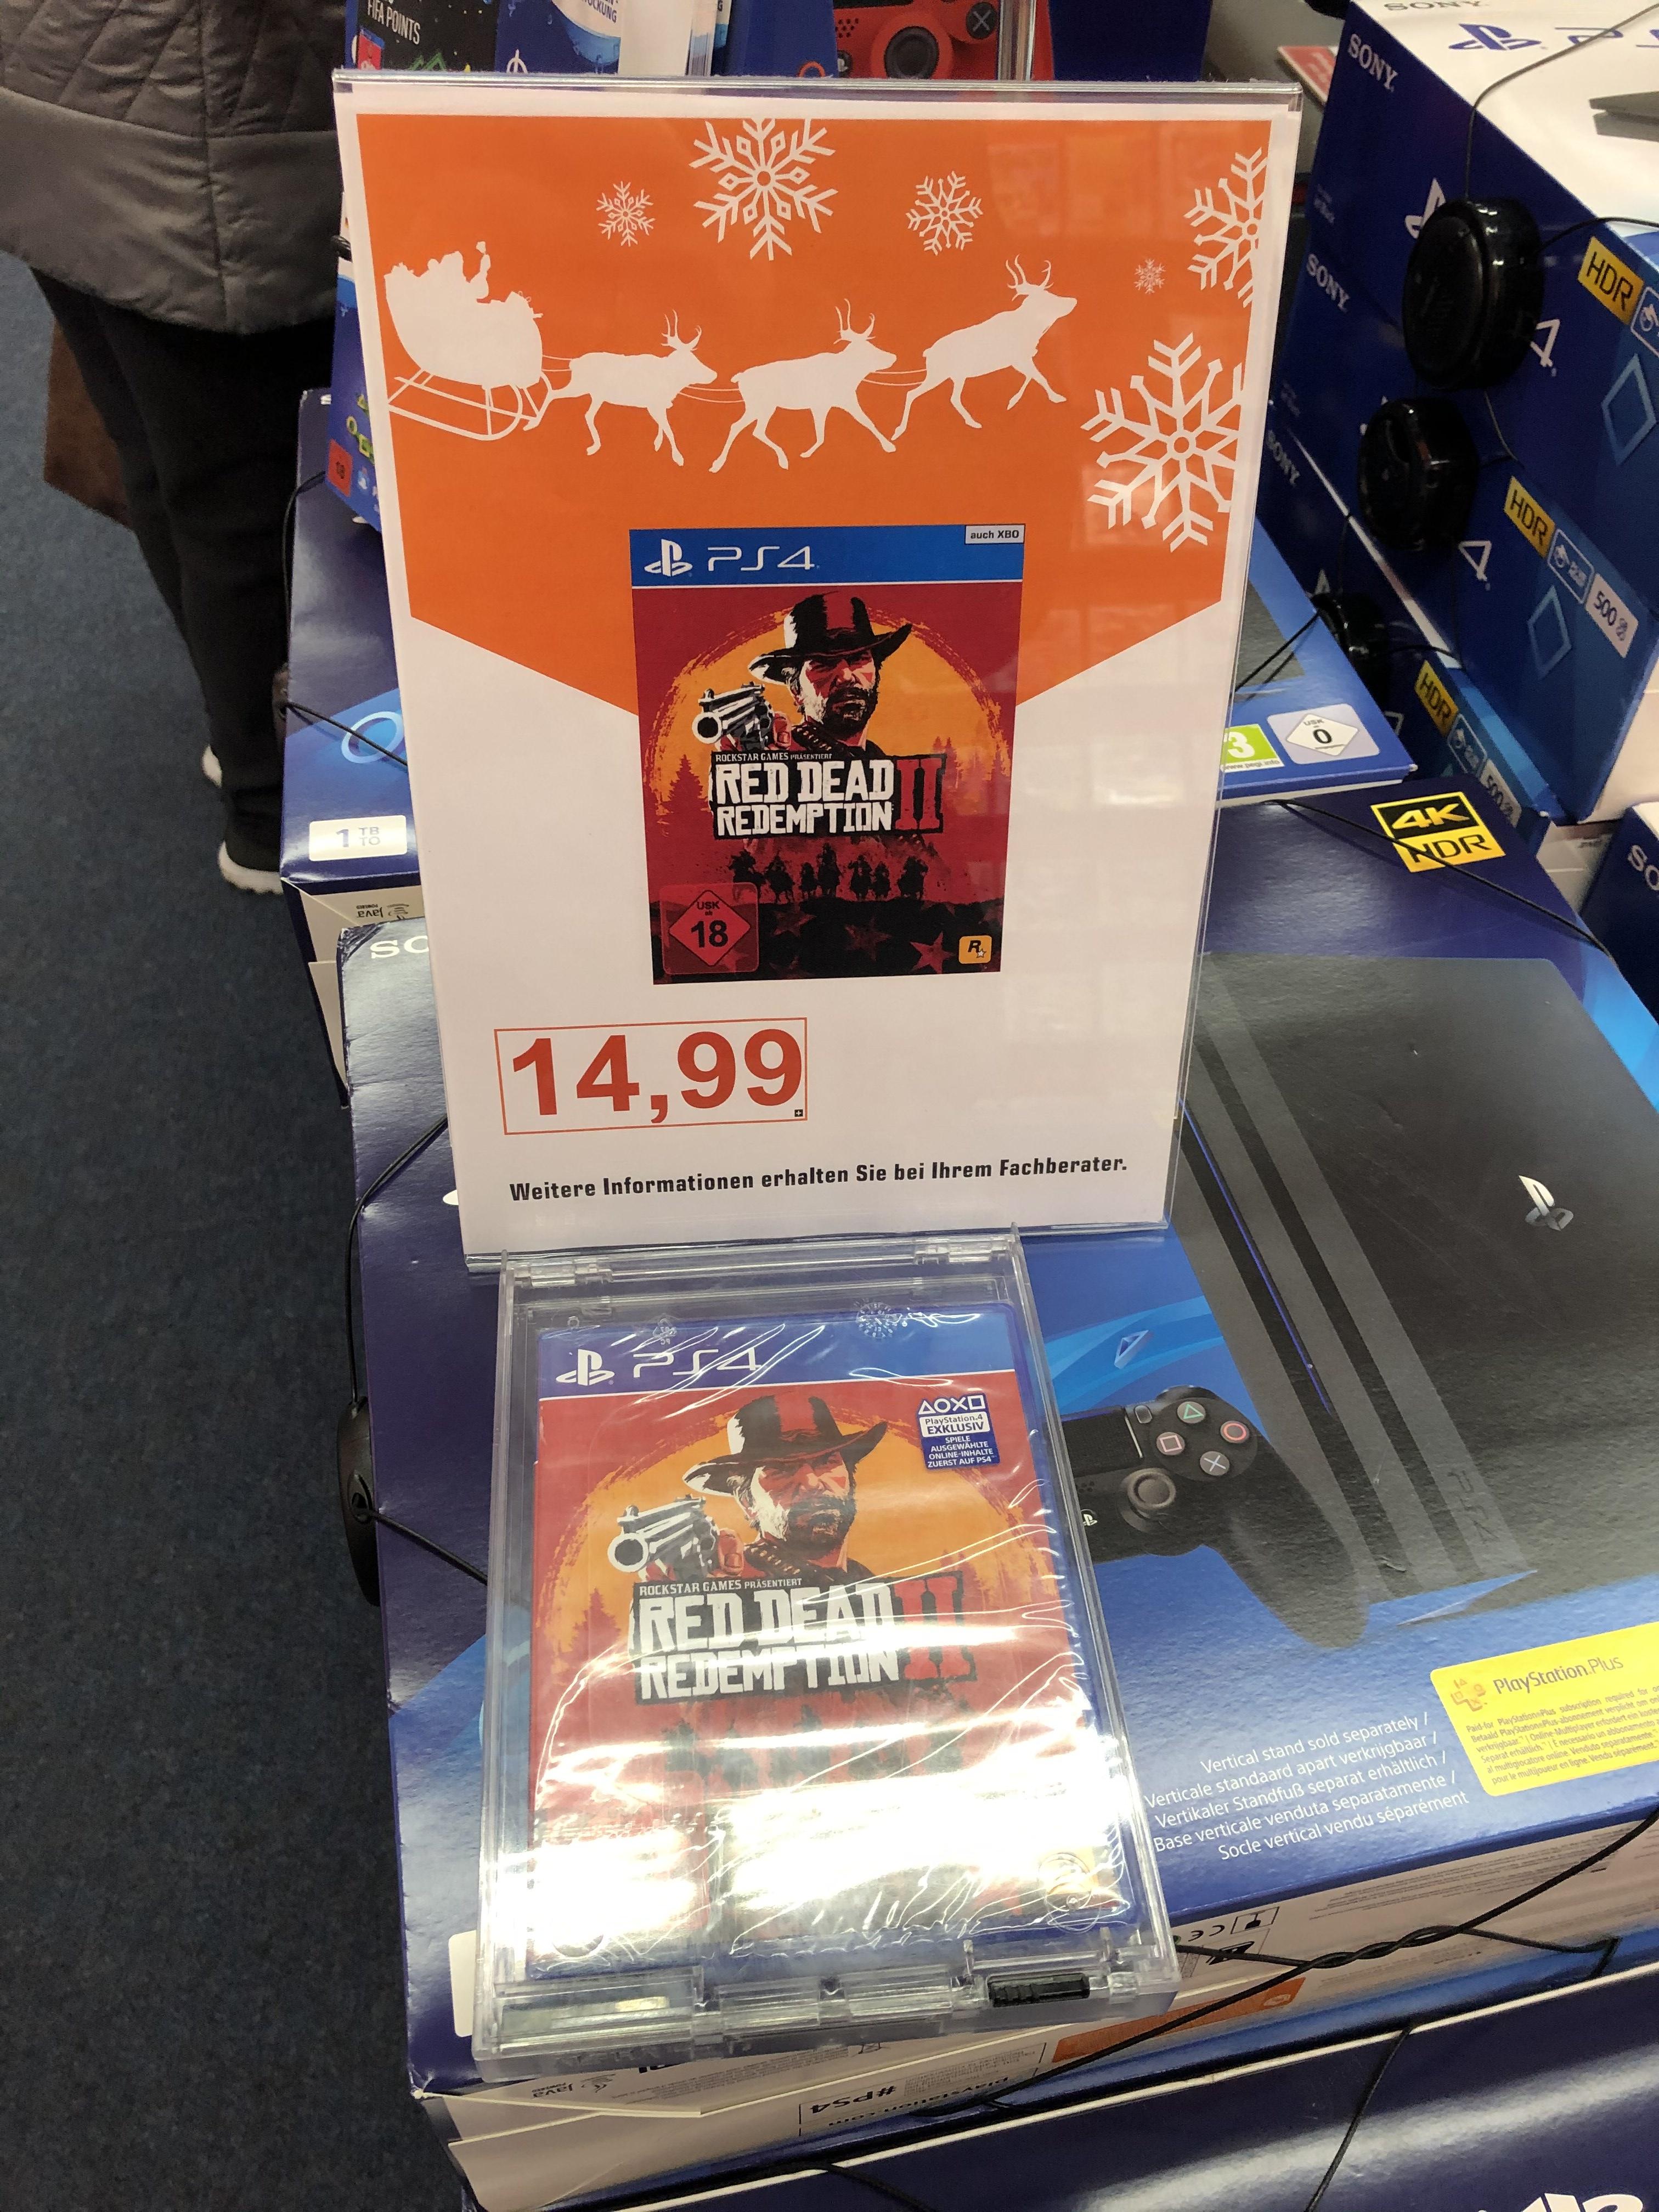 [Lokal Saturn Berlin Köpenick] Red Dead Redemption 2 II - PS4 Playsation 4 und Xbox One je 14,99€